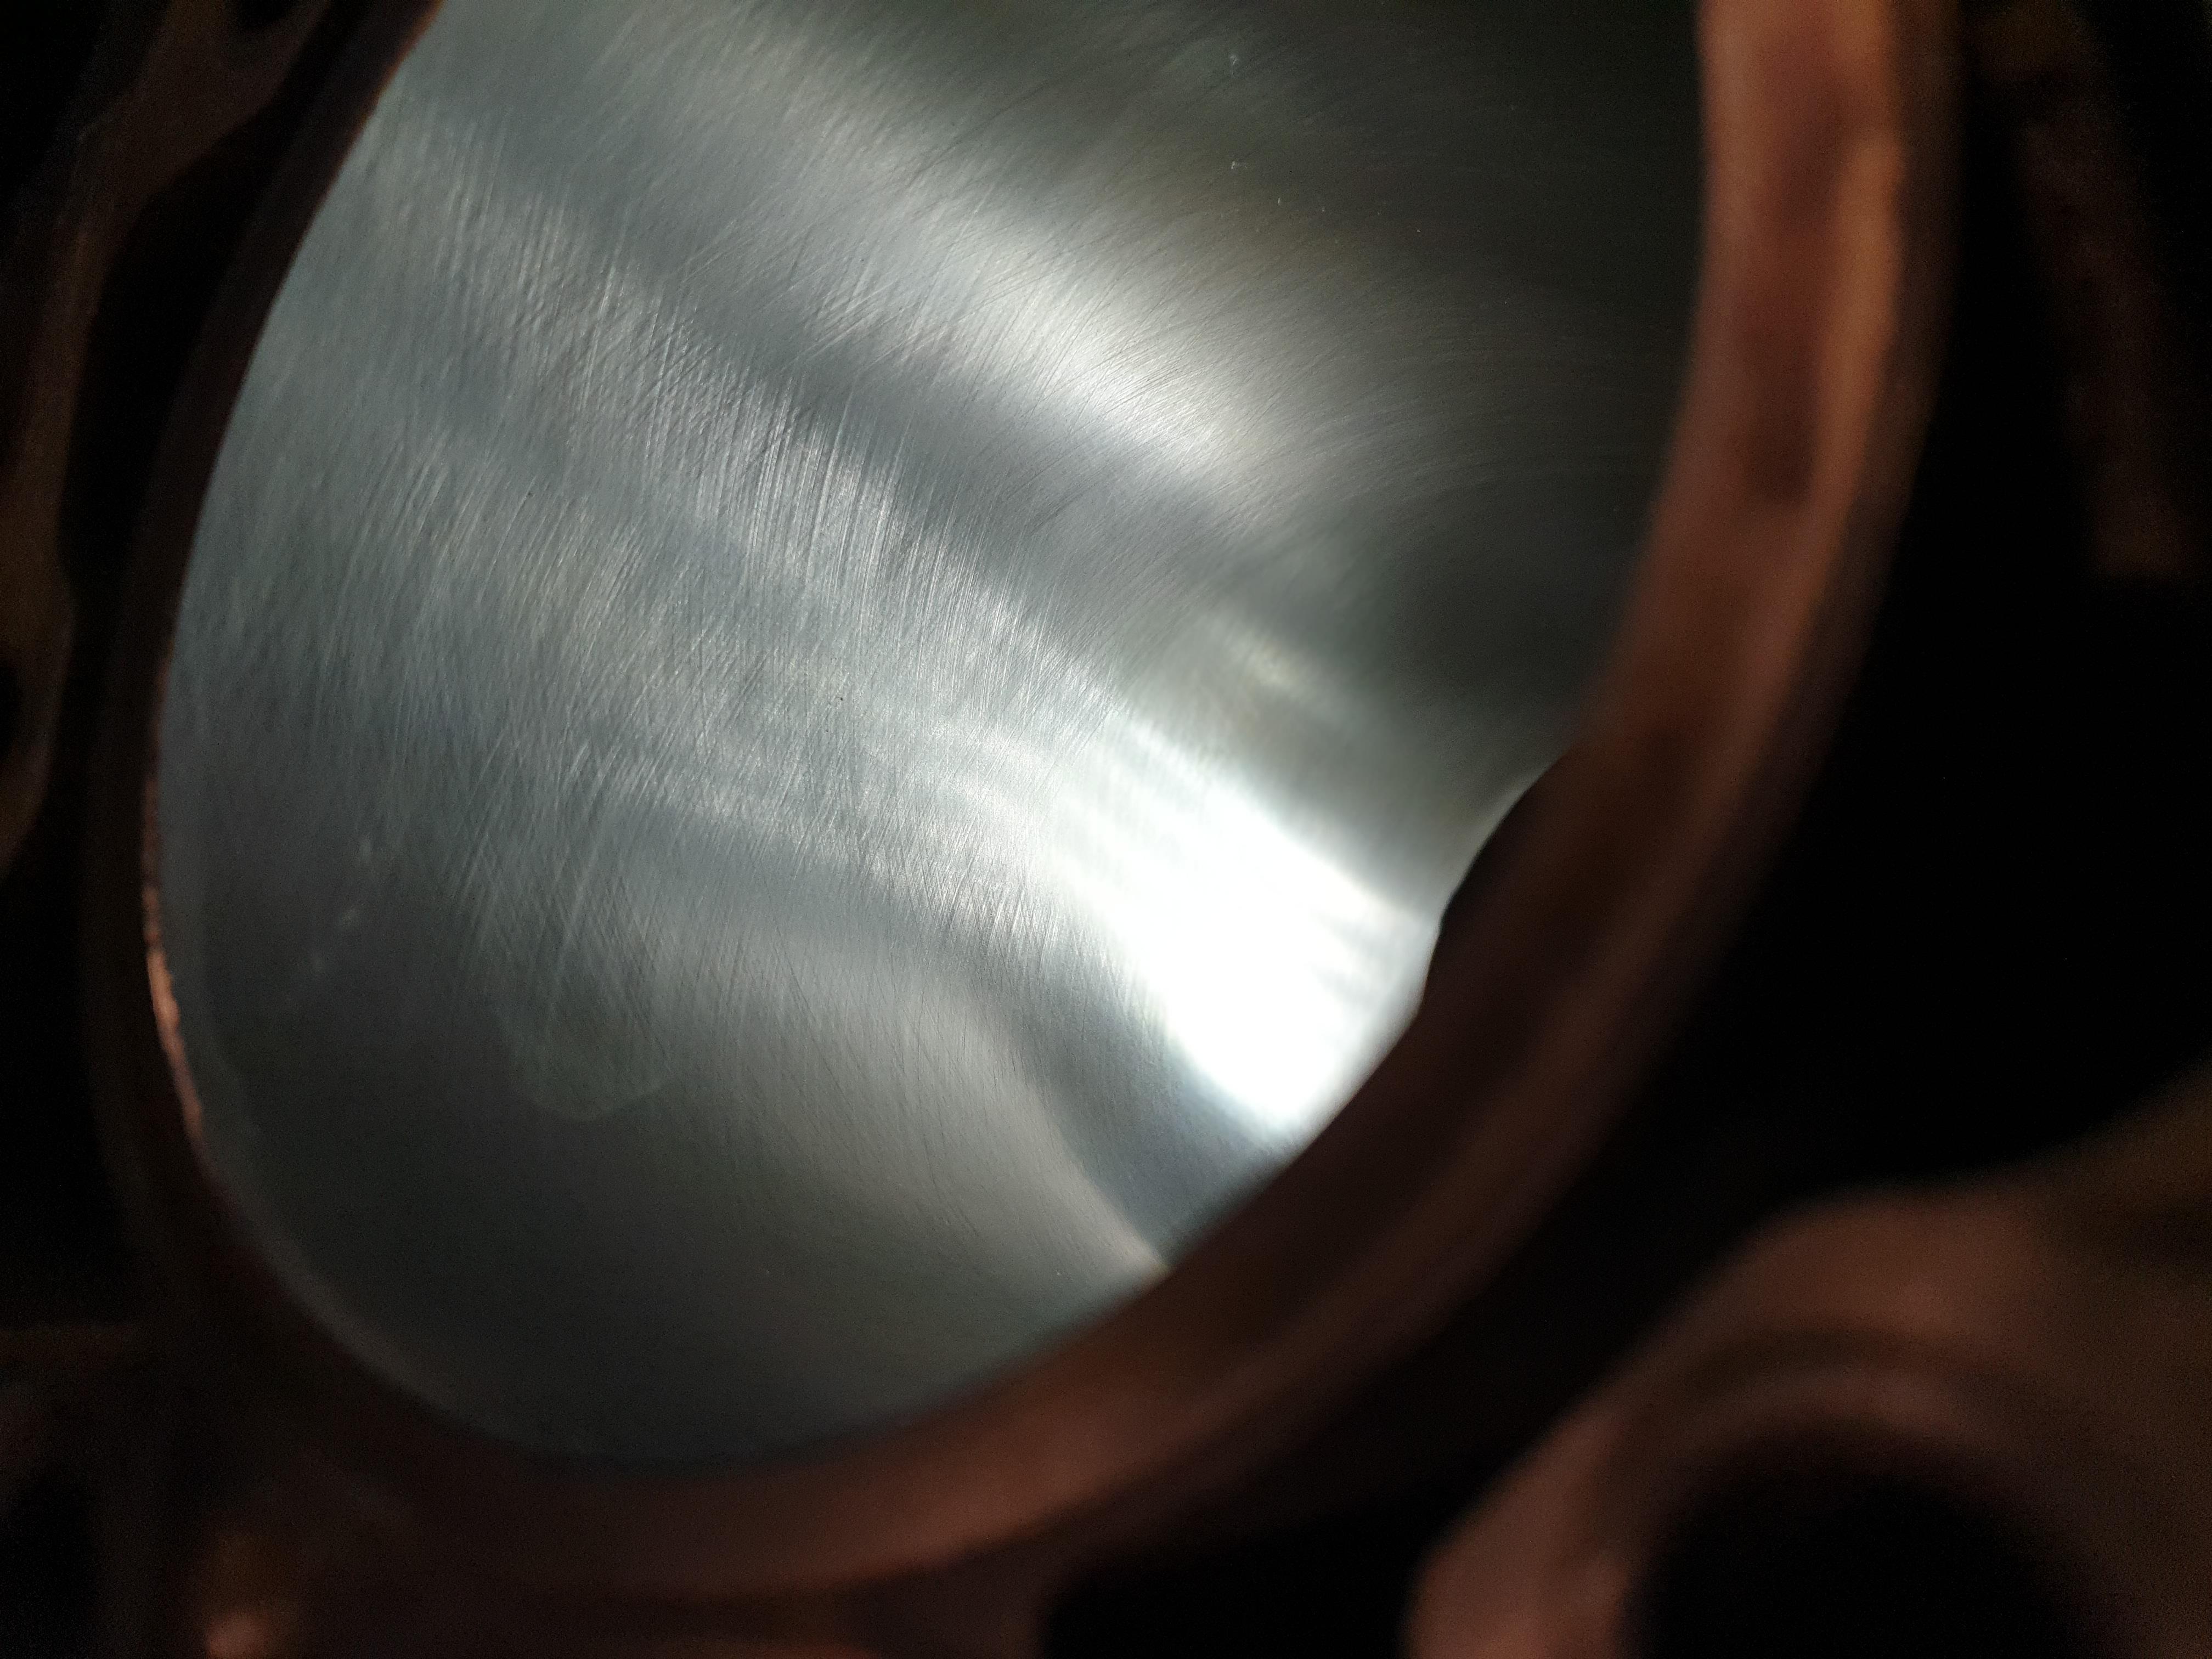 Cylinder close-up